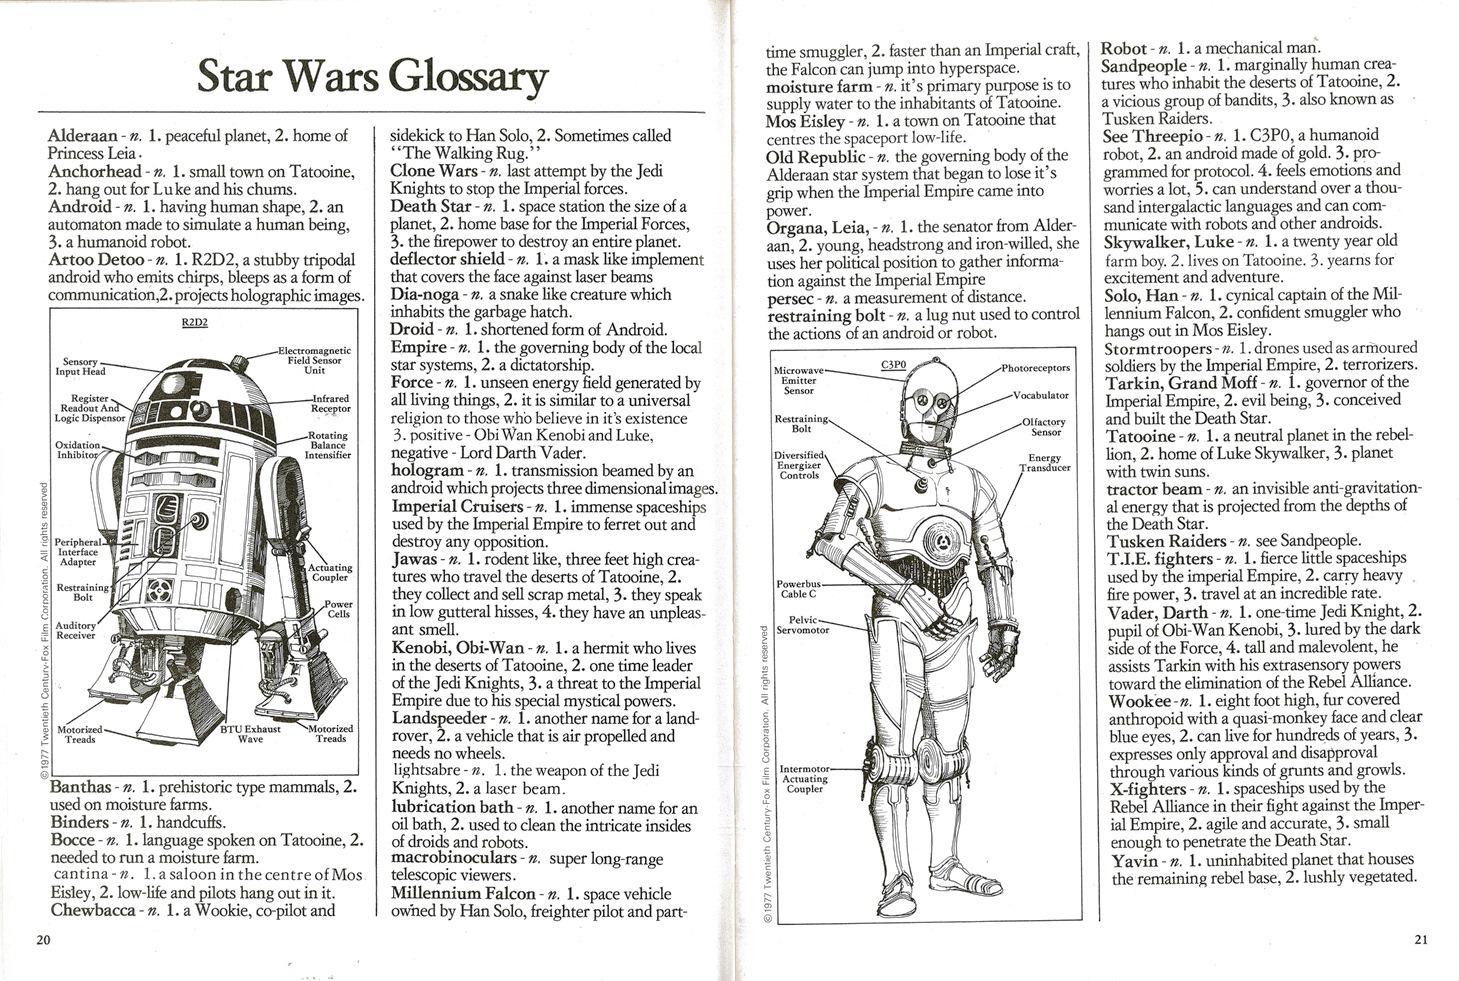 sw glossary.jpg